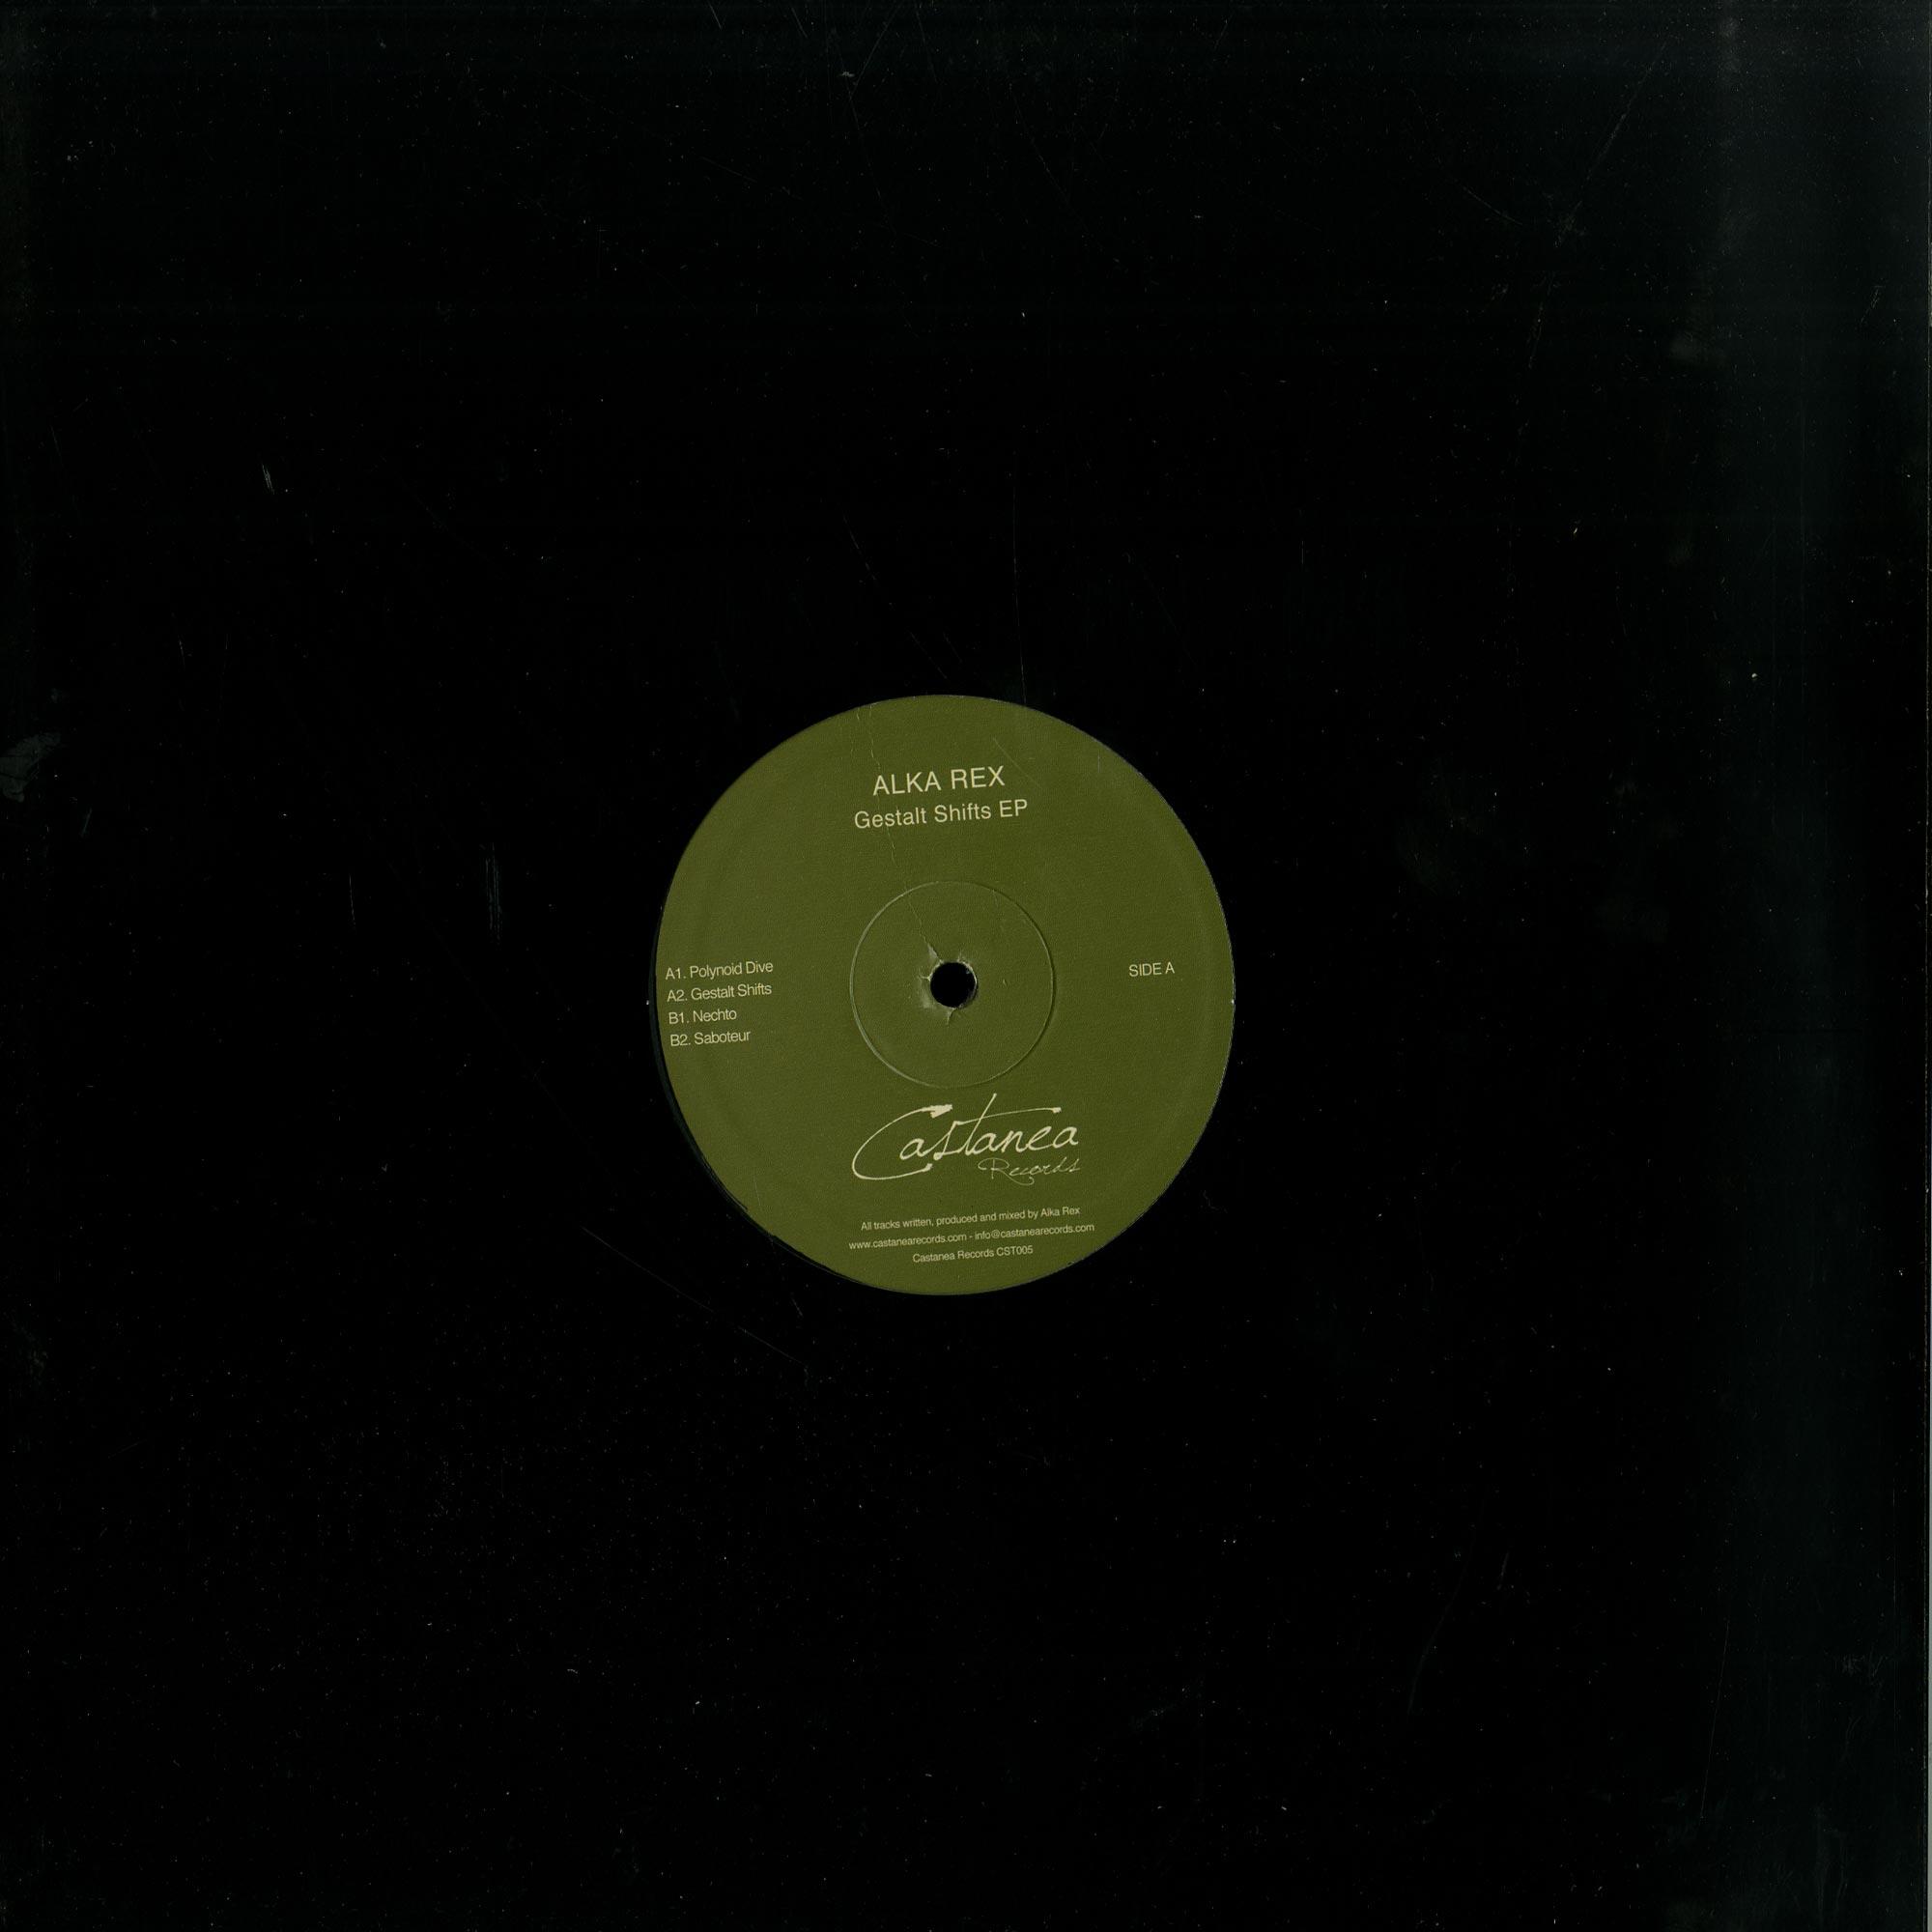 Alka Rex - GESTALT SHIFTS EP